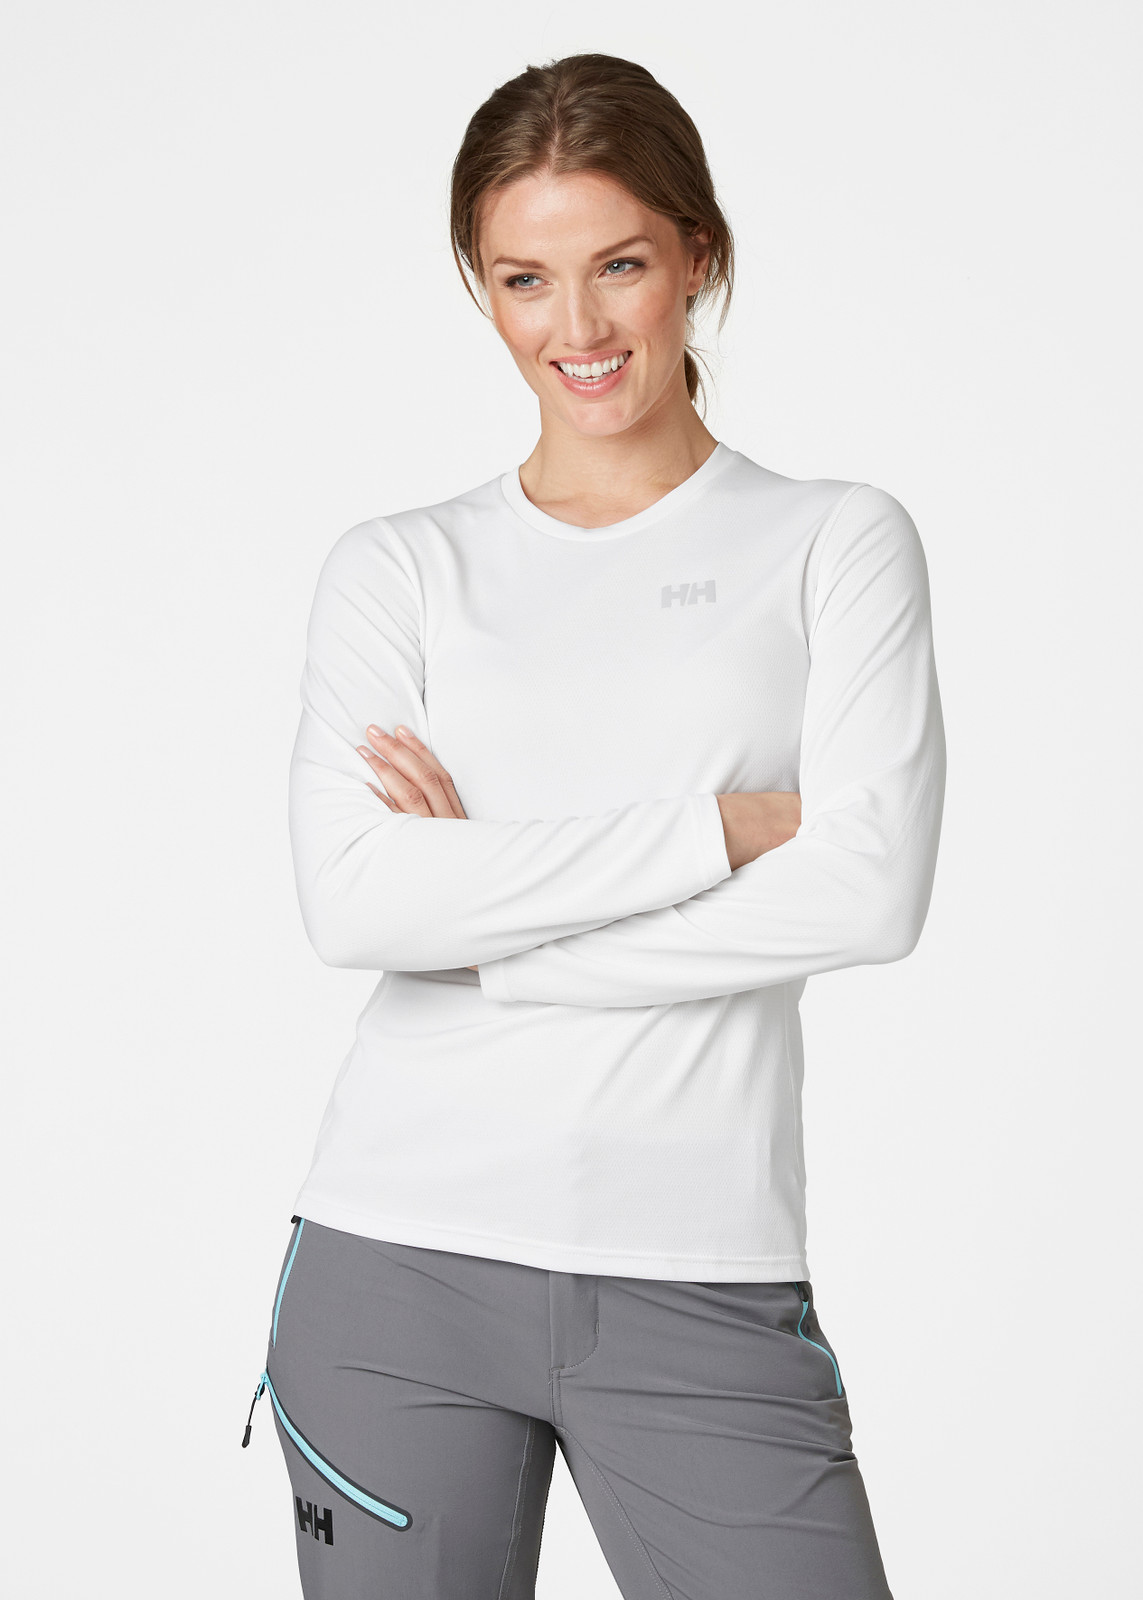 Helly Hansen Lifa Active Solen LS T-Shirt, Women's - White, 49352-001 on model